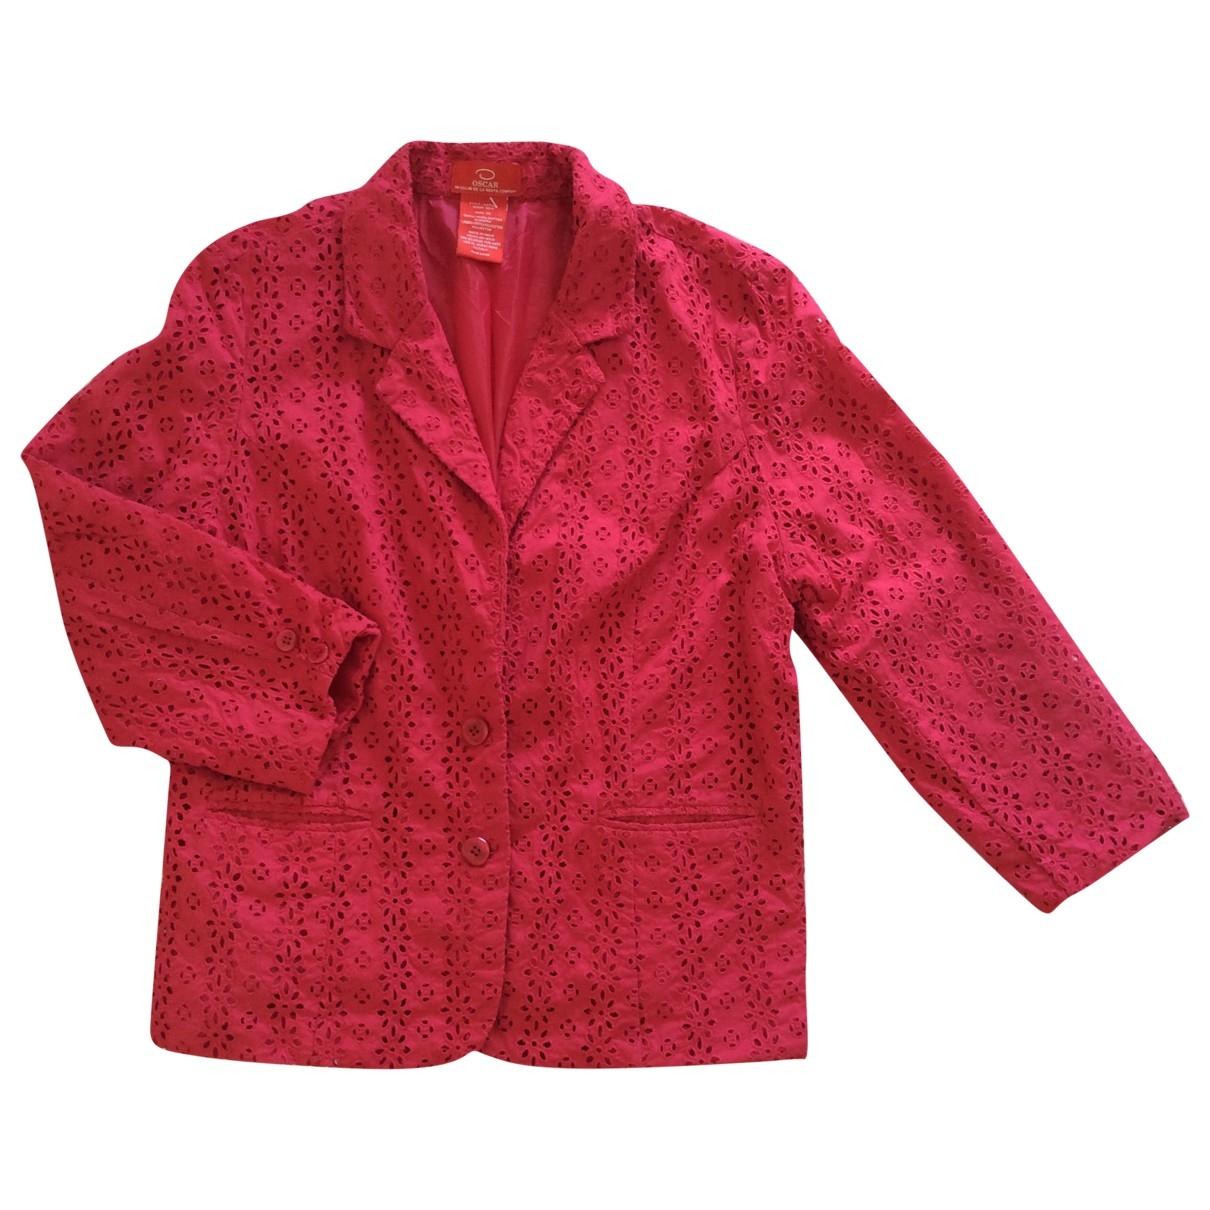 Oscar De La Renta \N Pink Cotton jacket for Women 14-16 US